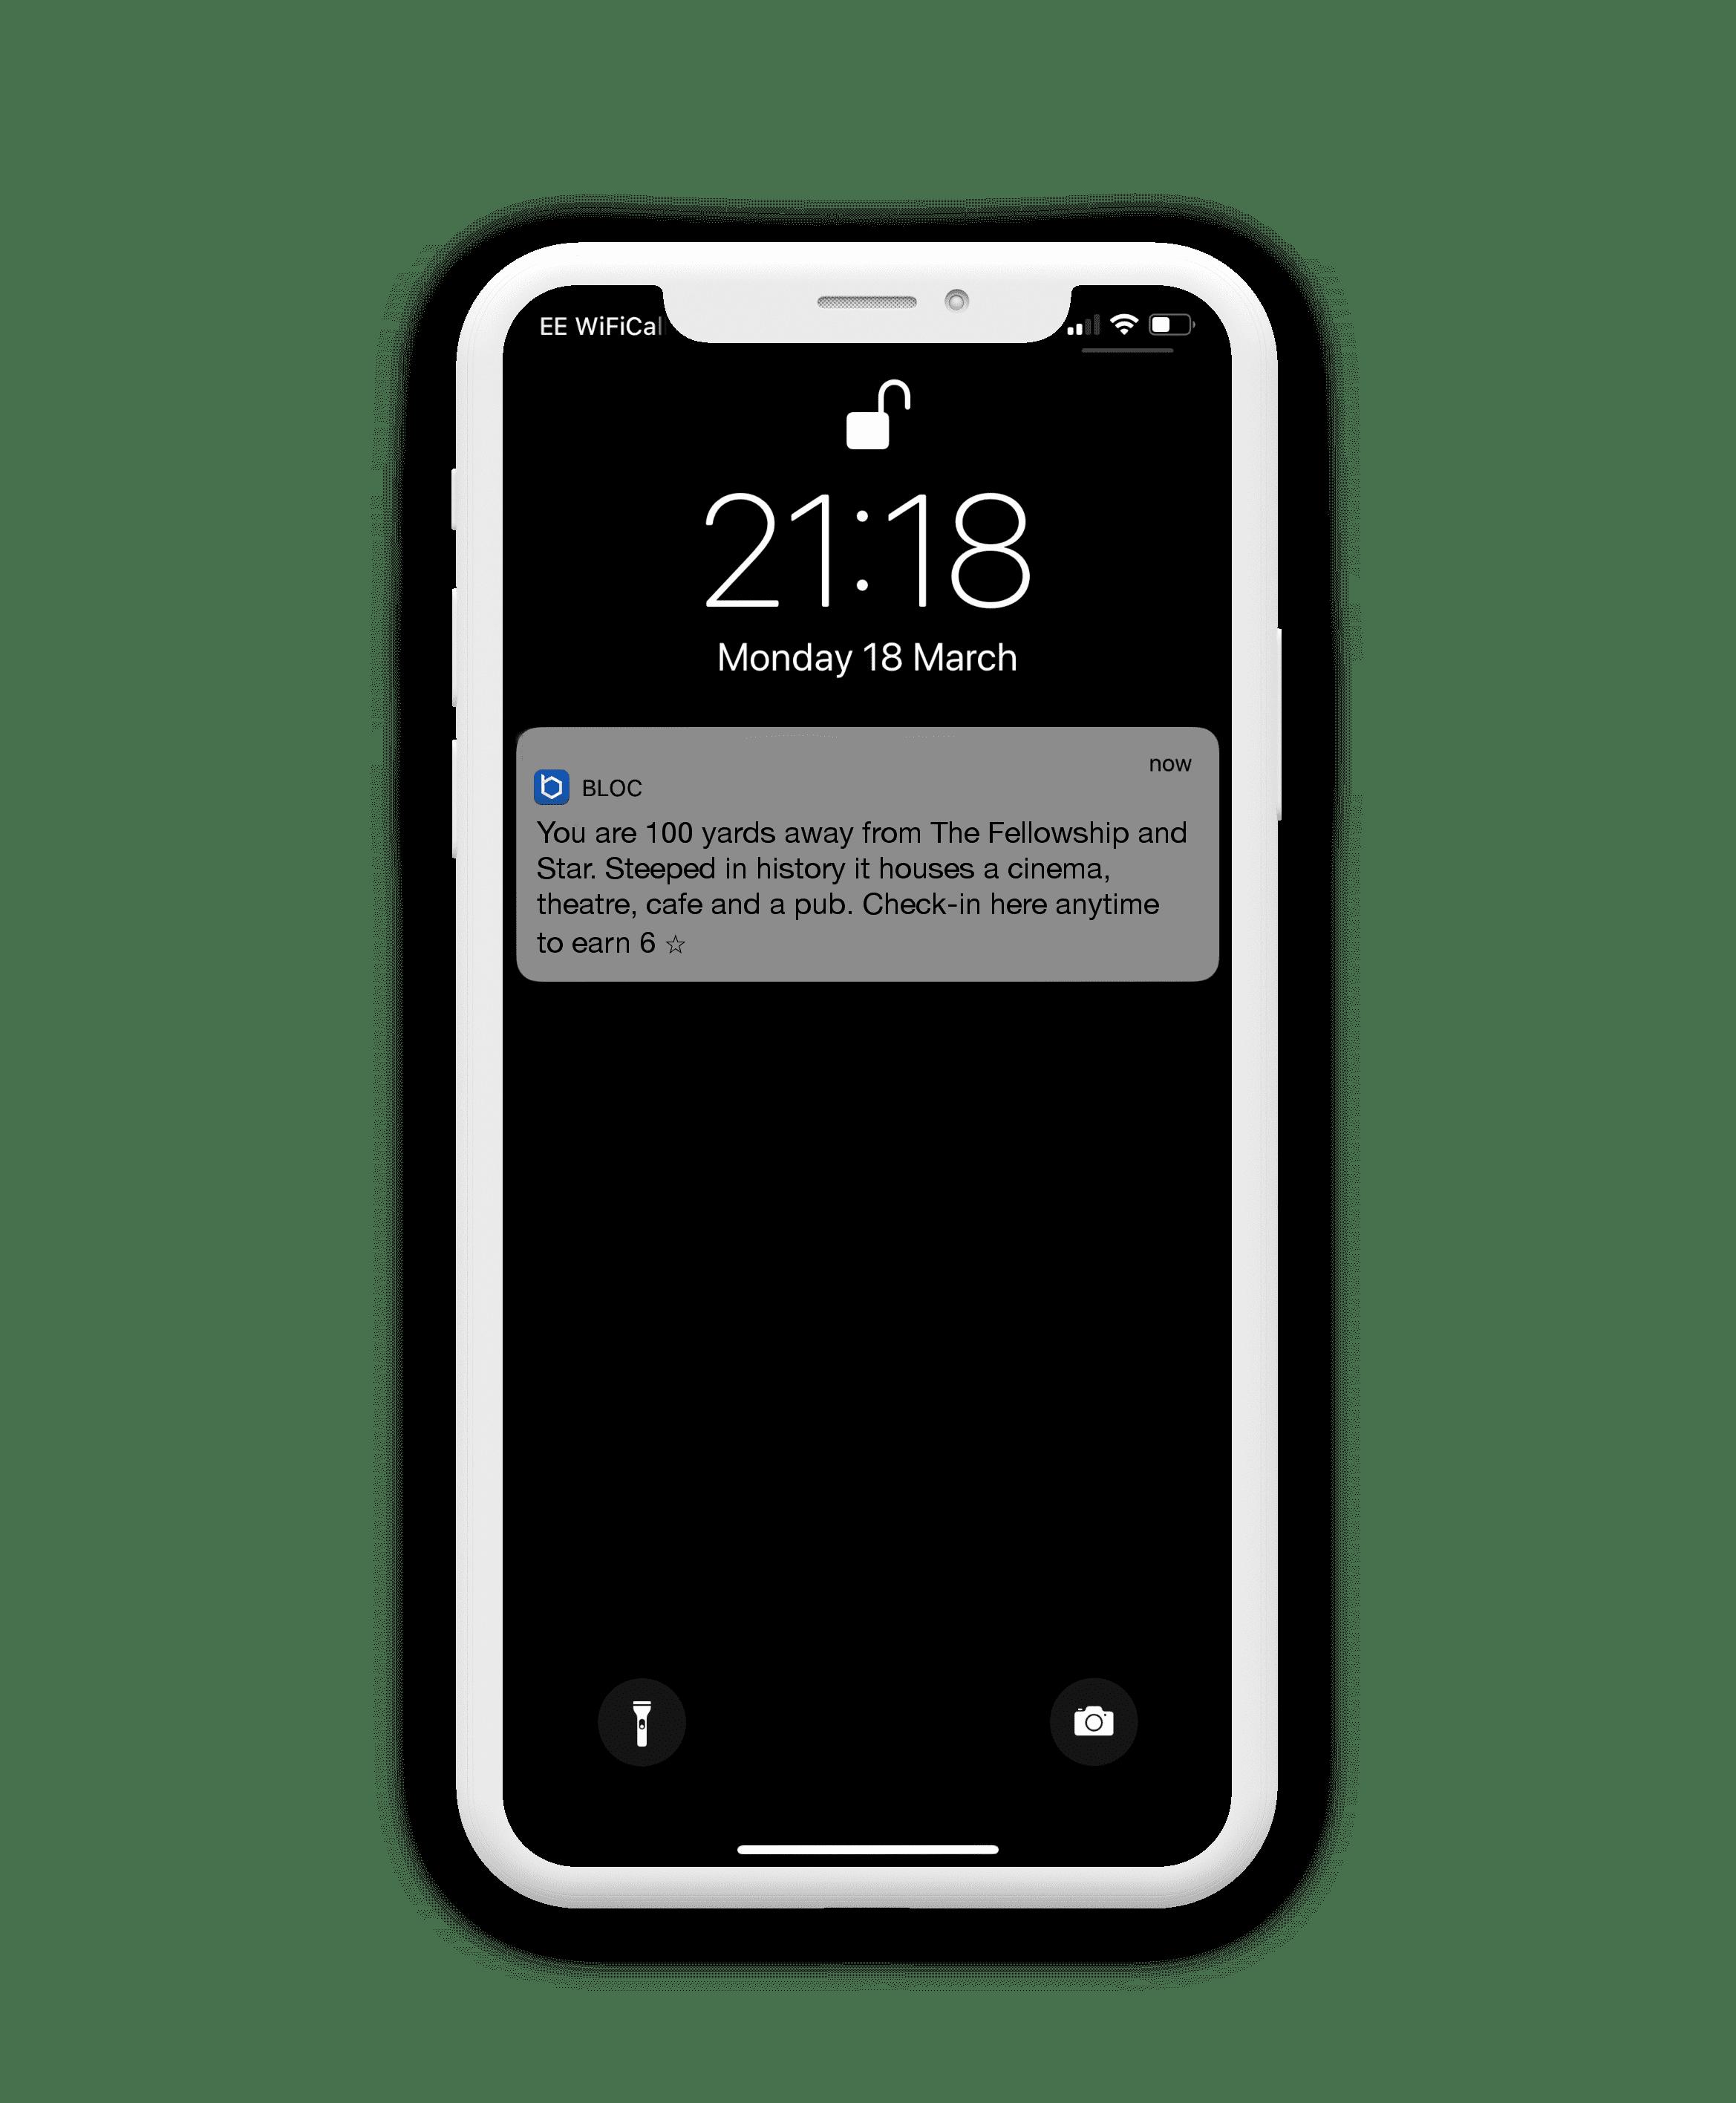 Bloc's 100 yard notification